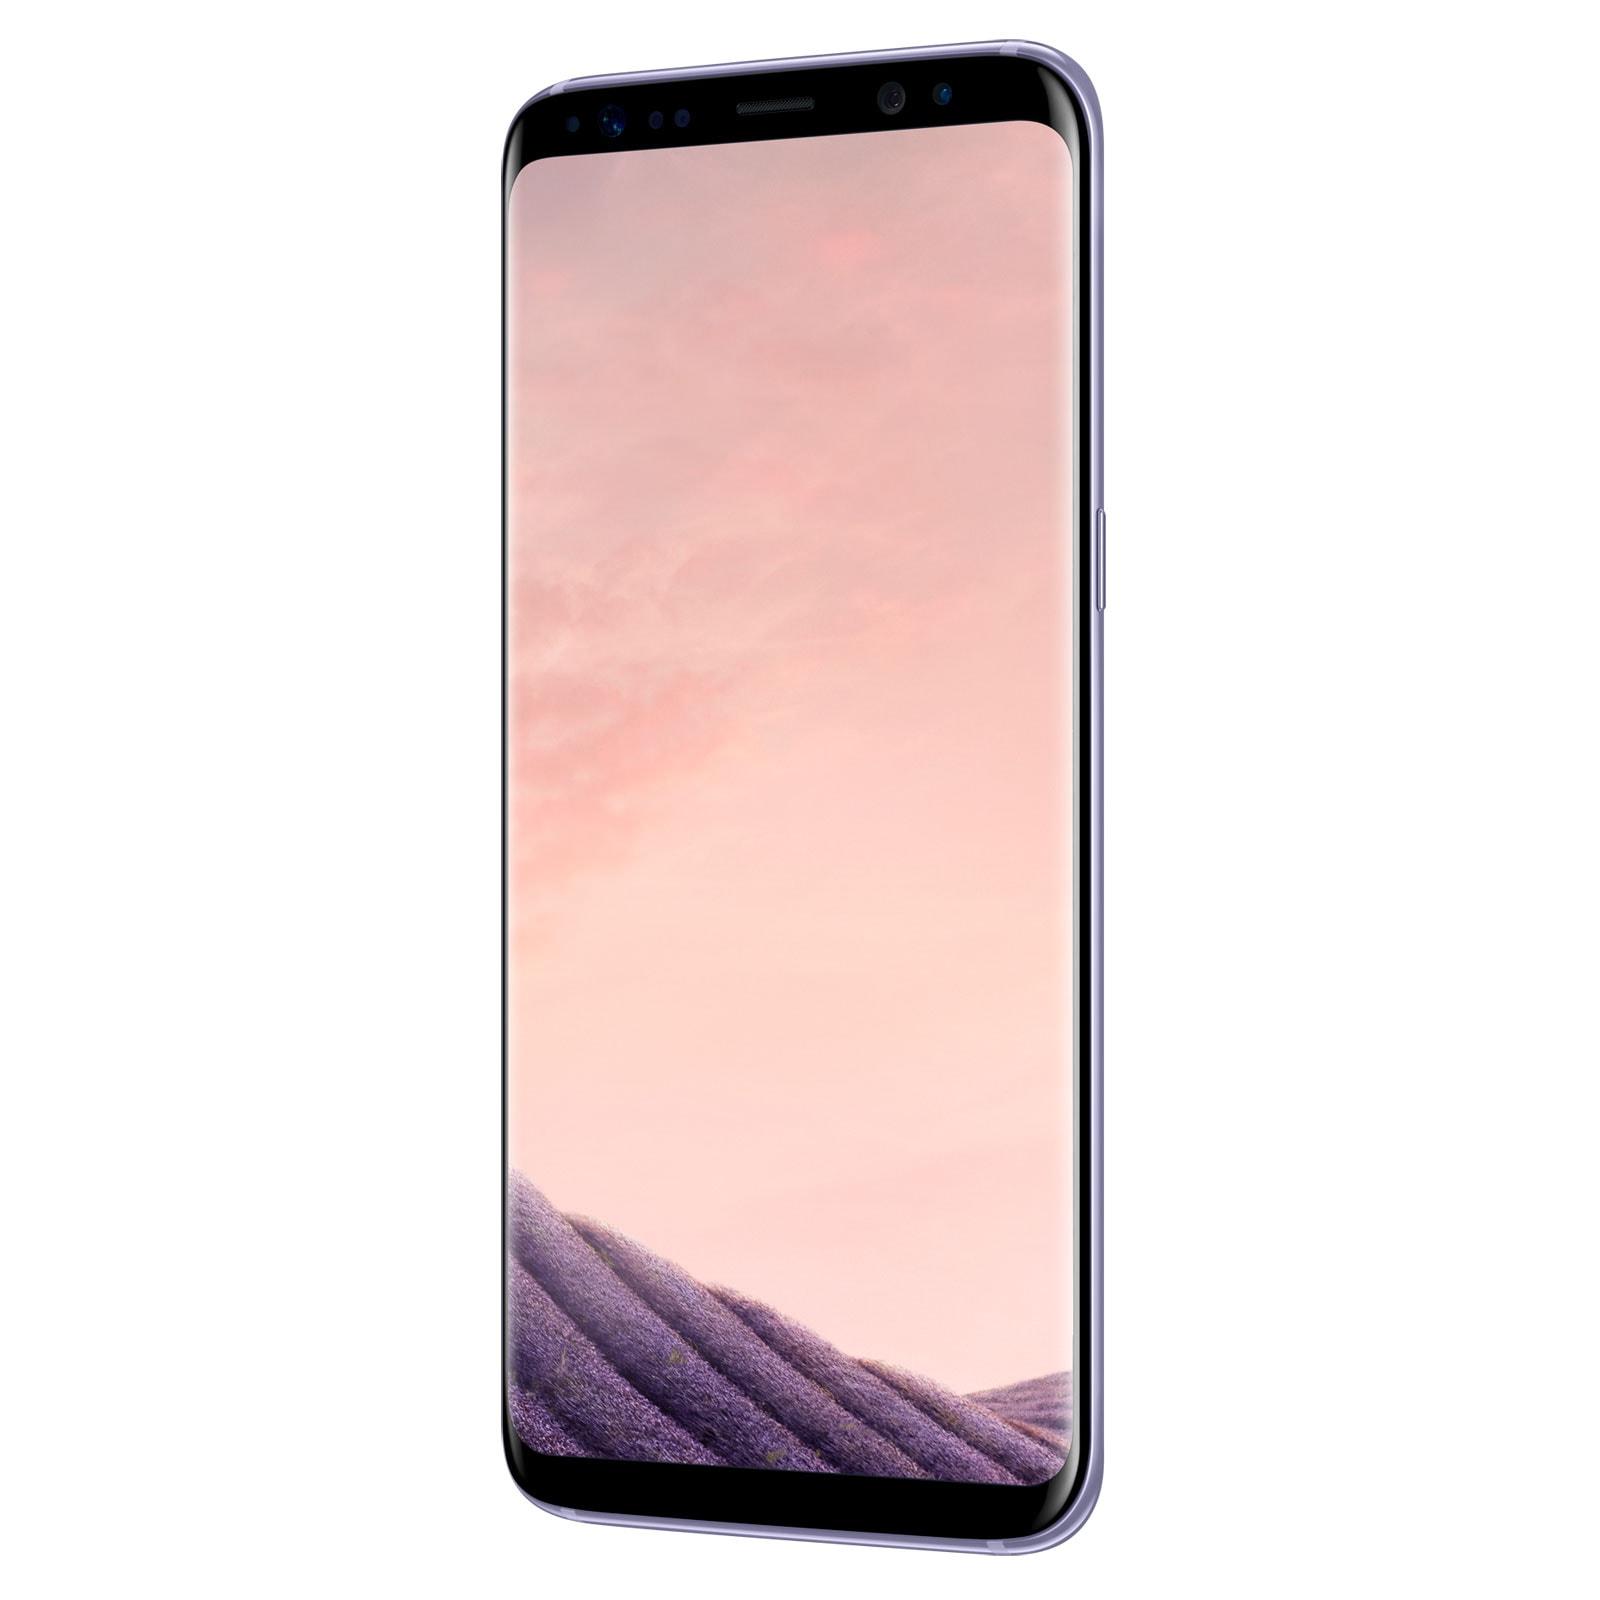 Samsung Galaxy S8 64Go G950 Orchid Gray - Téléphonie Samsung - 2